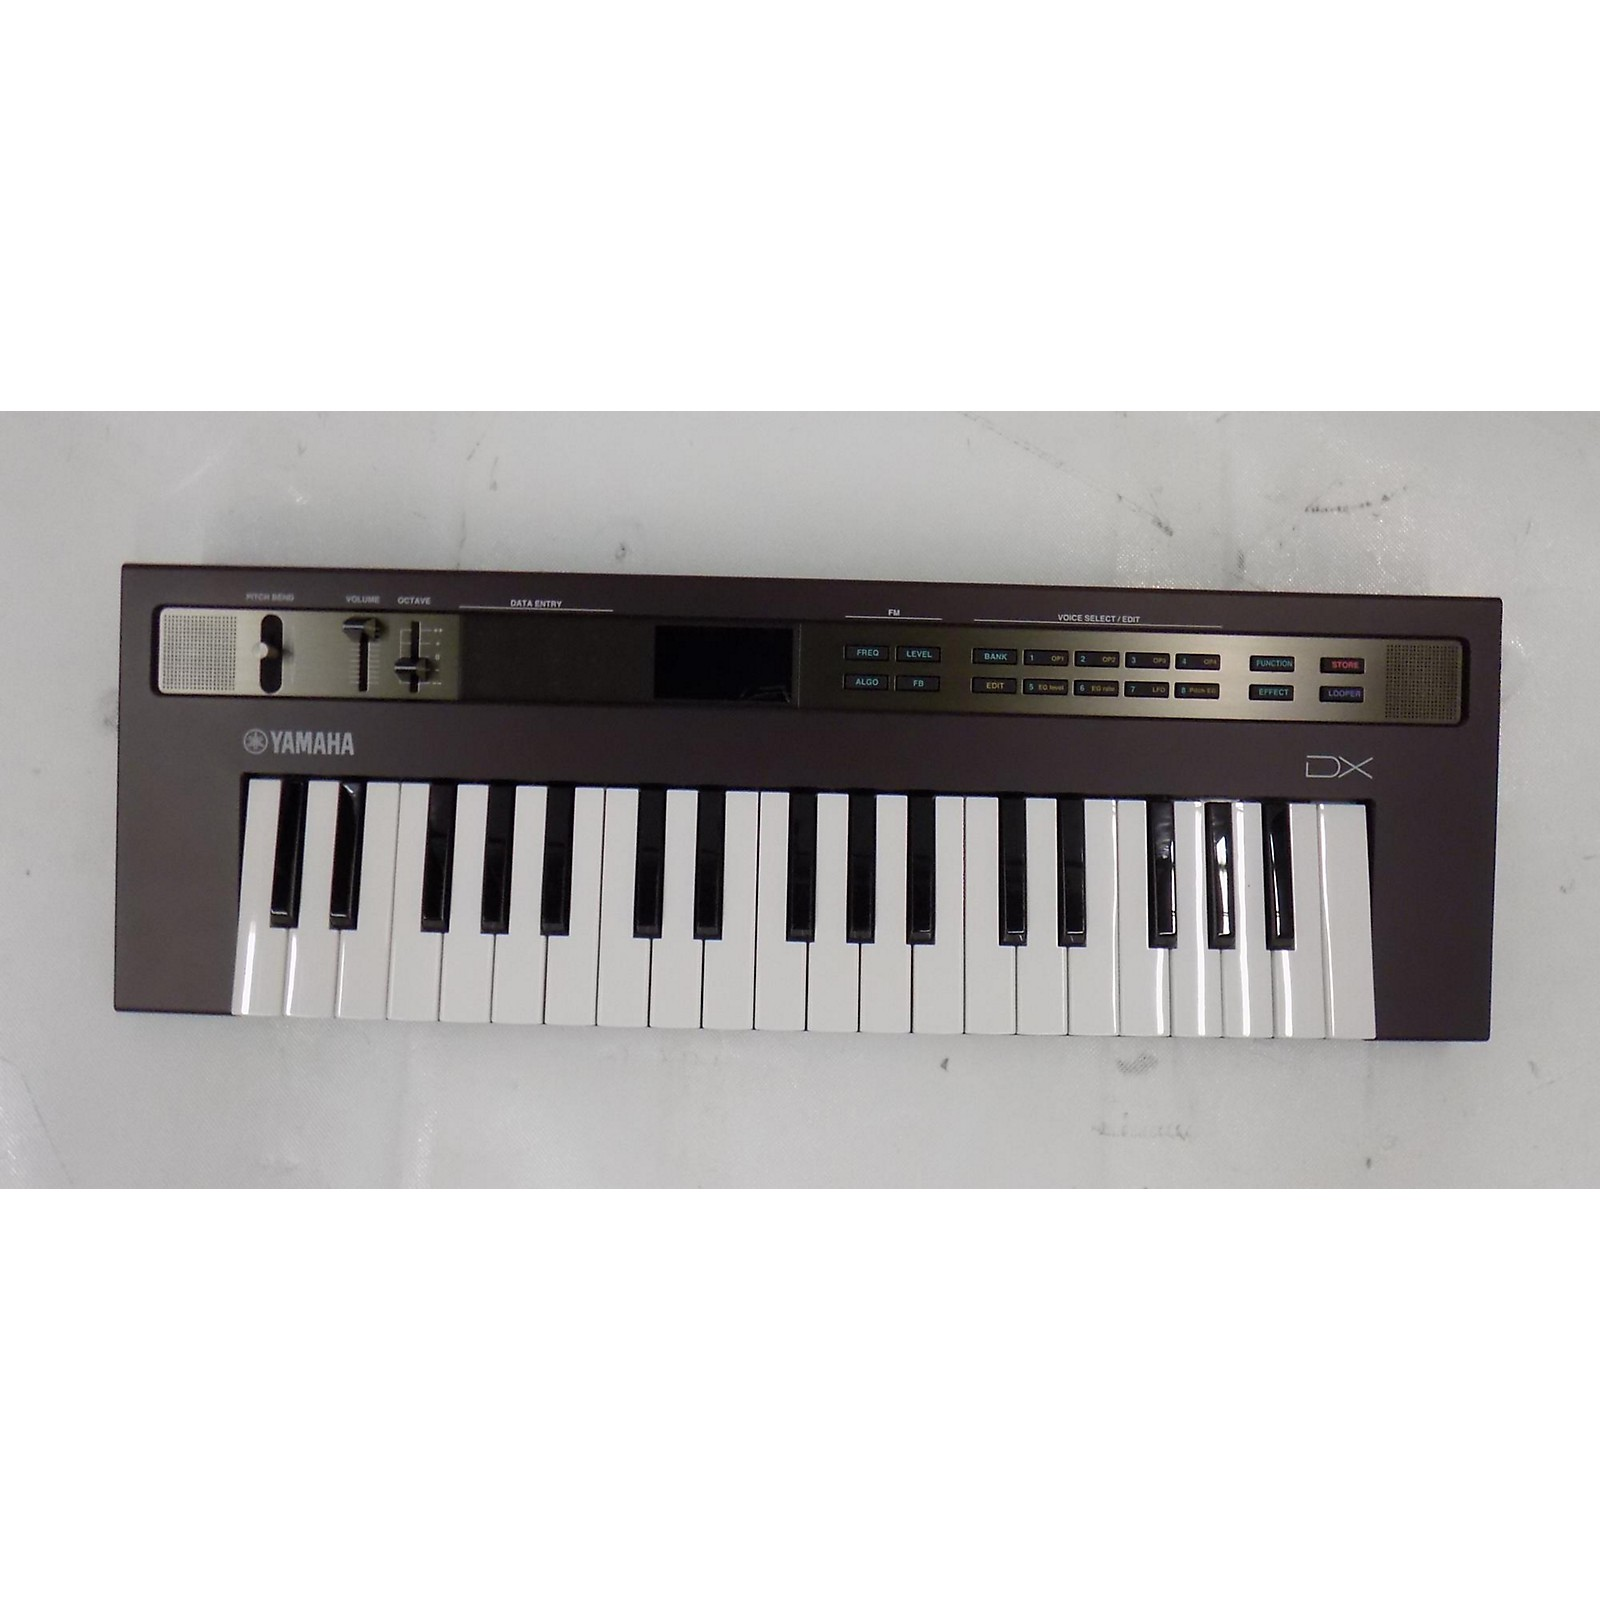 Yamaha REFACE DX Portable Keyboard